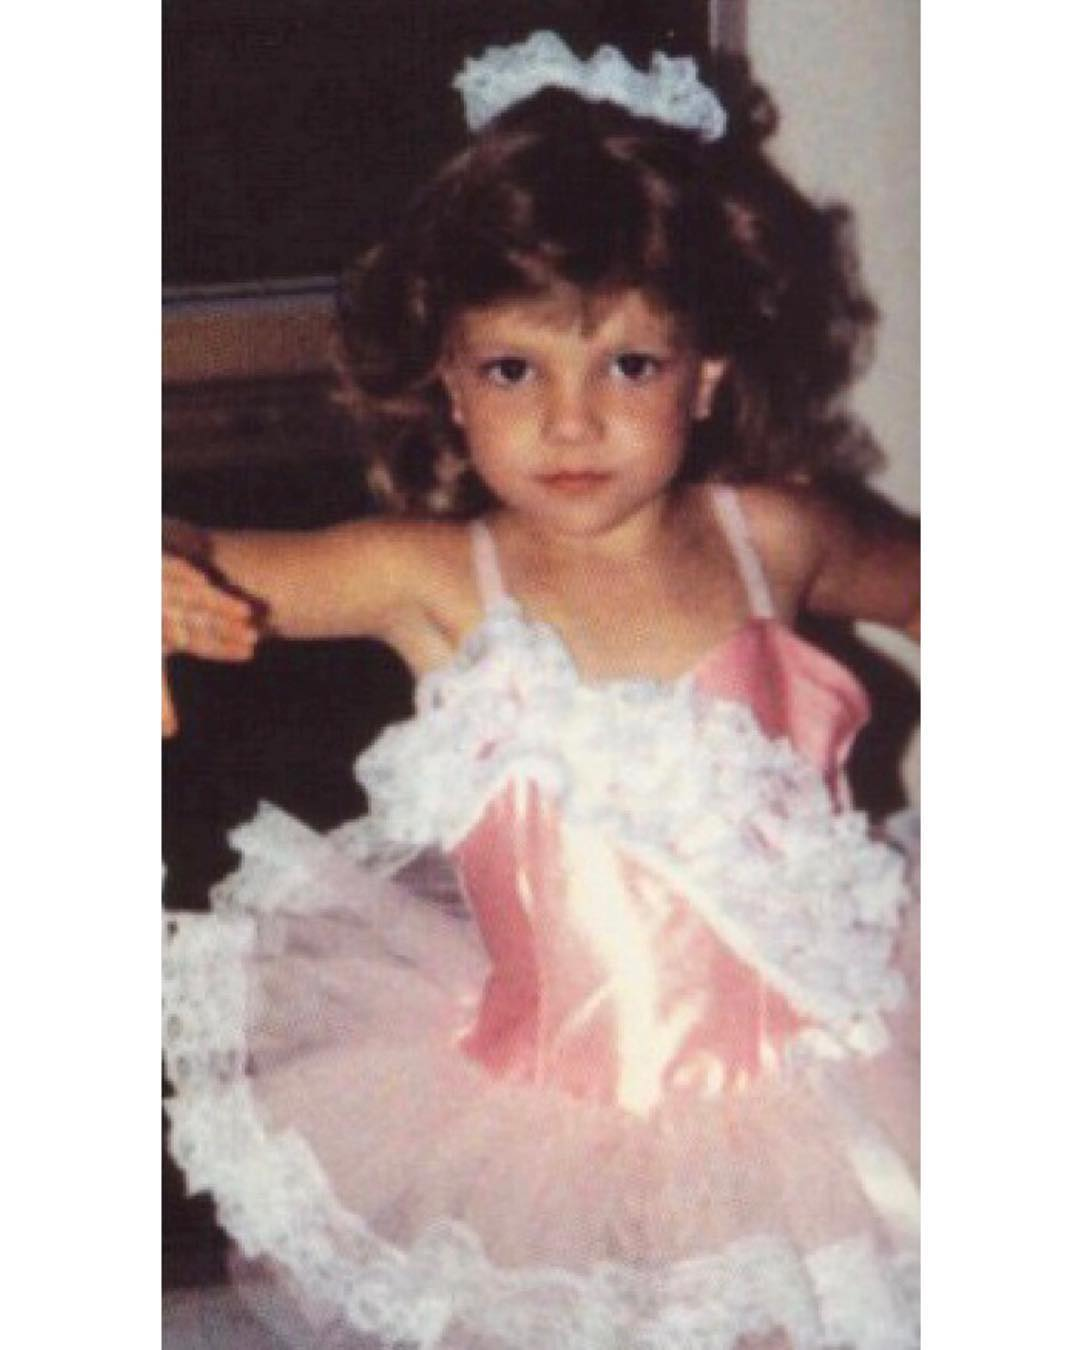 Britney Spears de pequeña